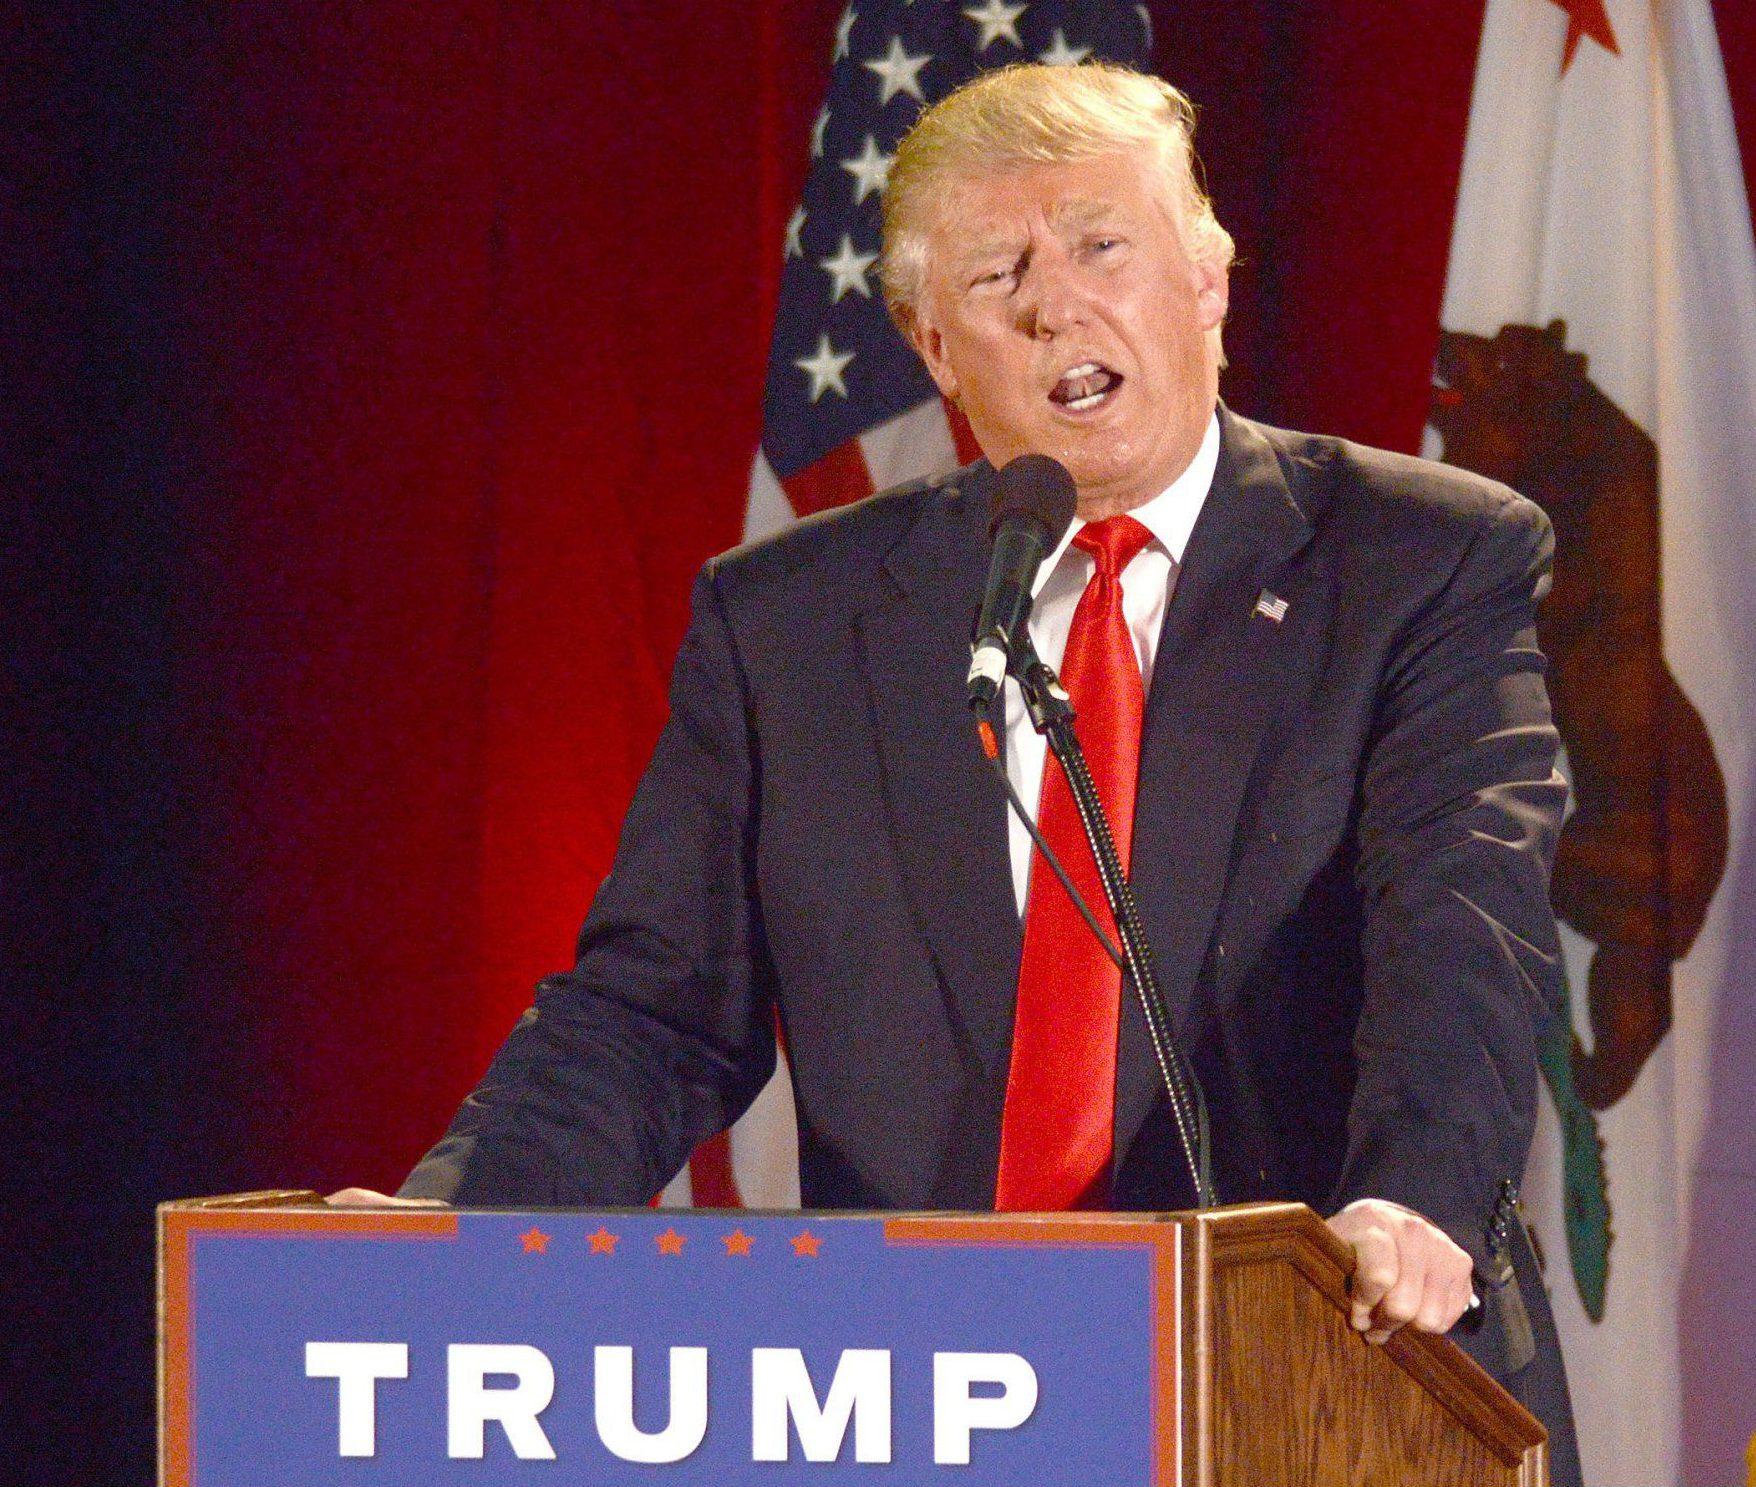 Mandatory Credit: Photo by ddp USA/REX/Shutterstock (5701893h)nDonald TrumpnDonald Trump campaigning in San Jose, California, America - 02 Jun 2016nn